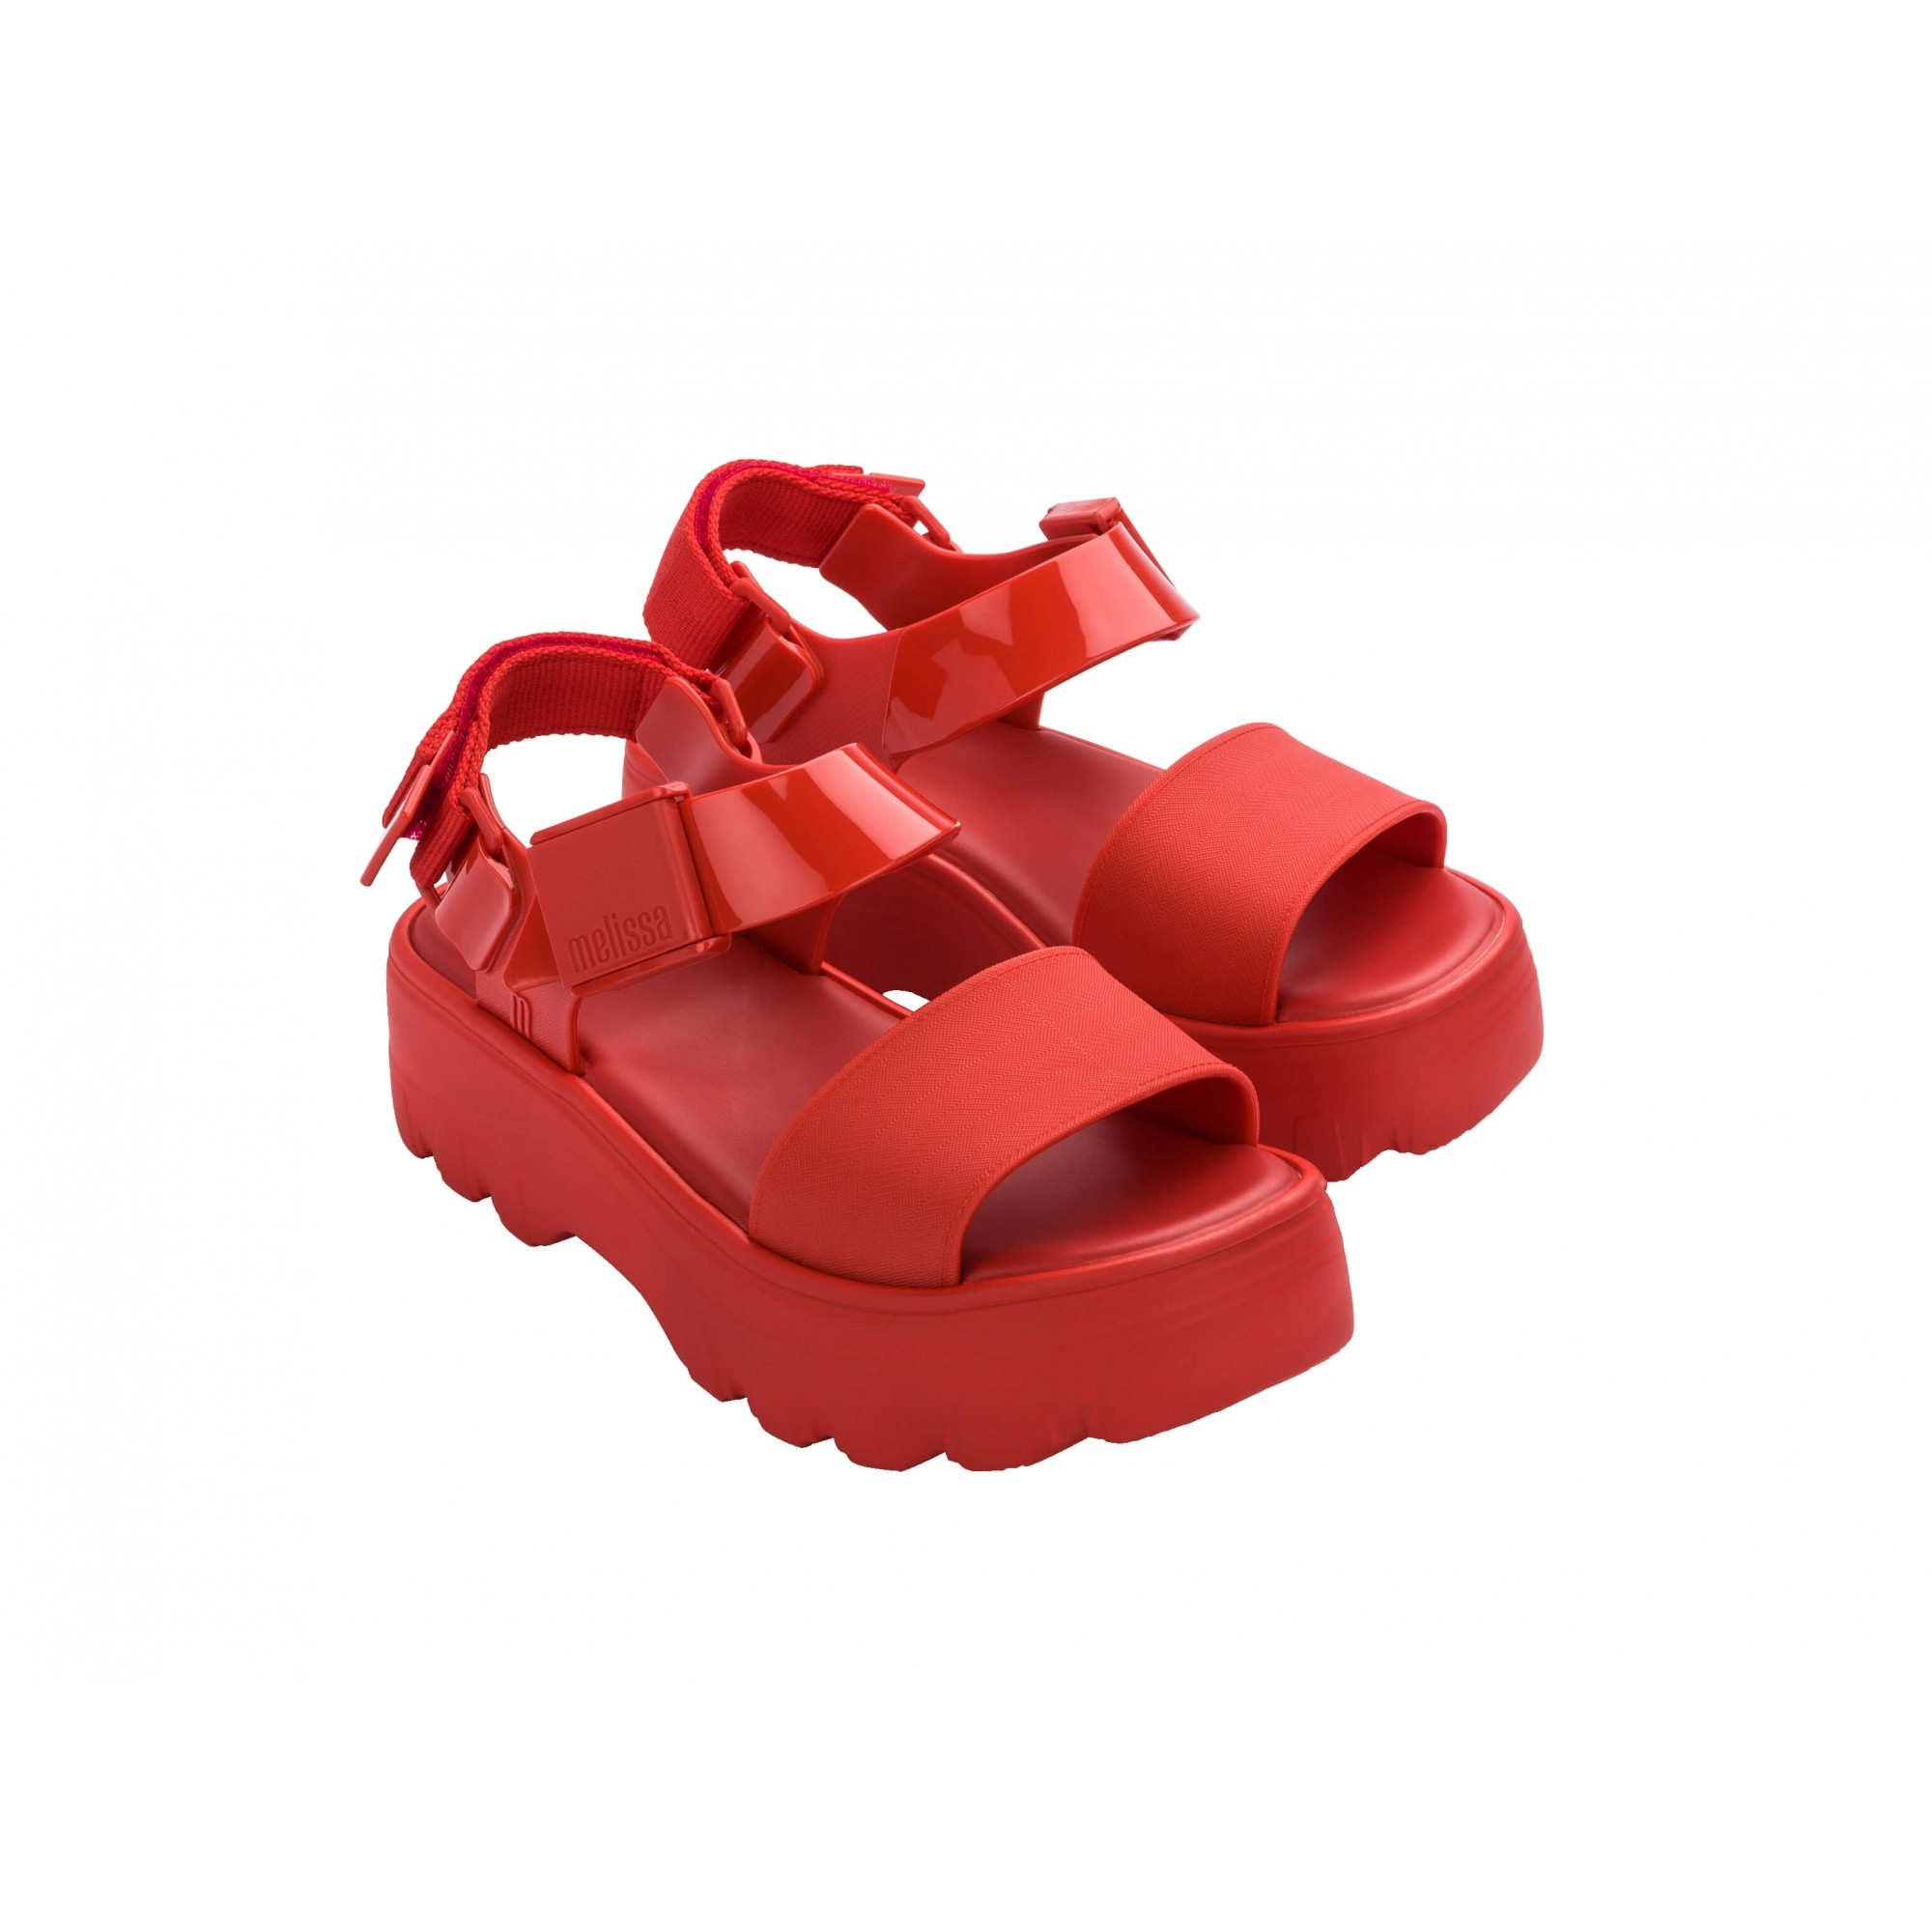 Melissa Kick Off Sandal  - Choque Concept